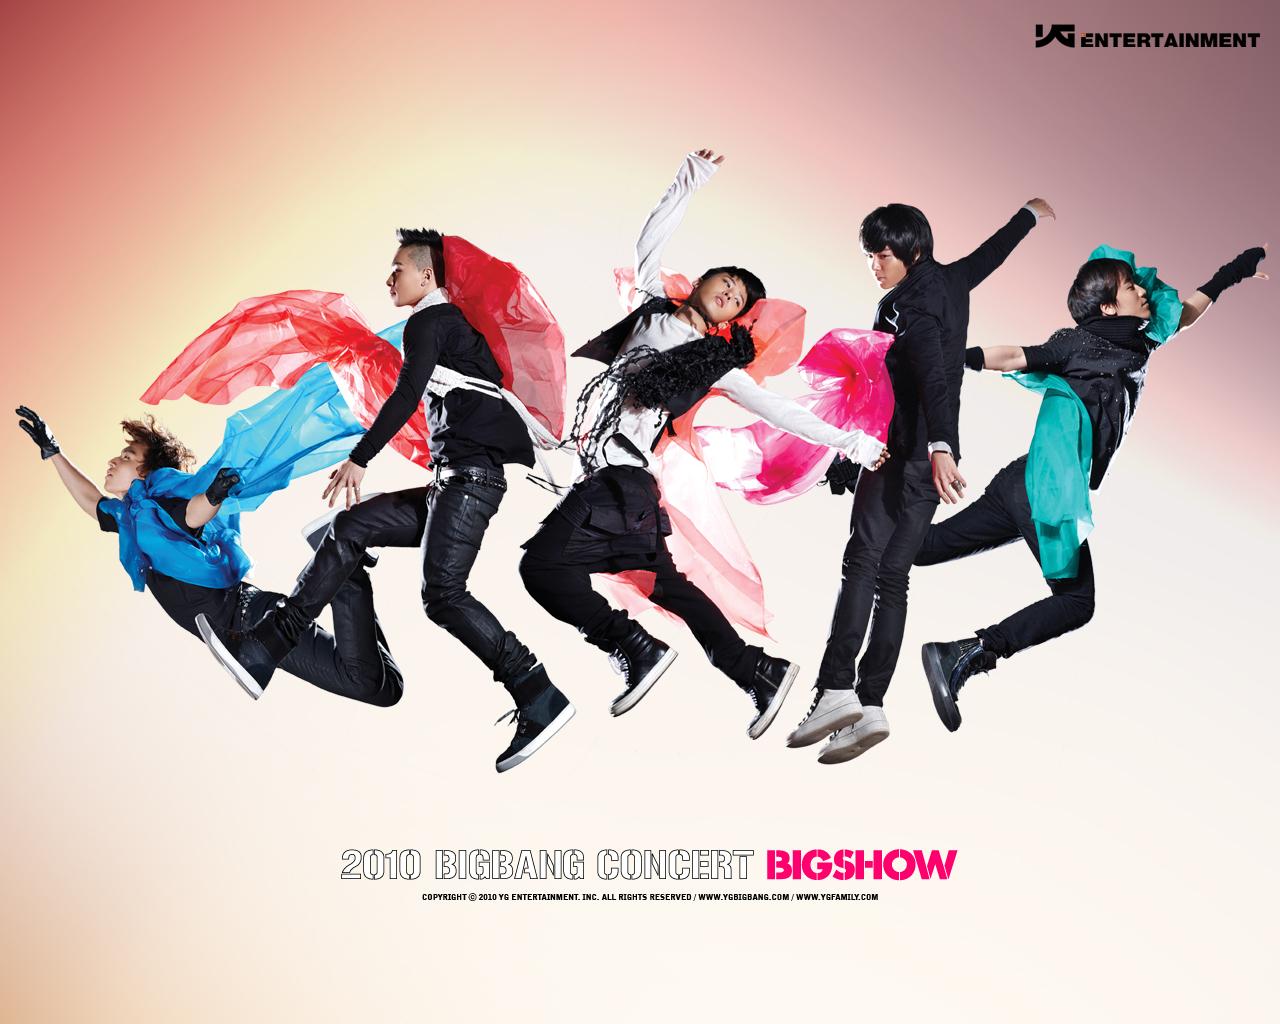 Bigbang 壁紙6枚追加 Bigbang Wallpaper 壁紙